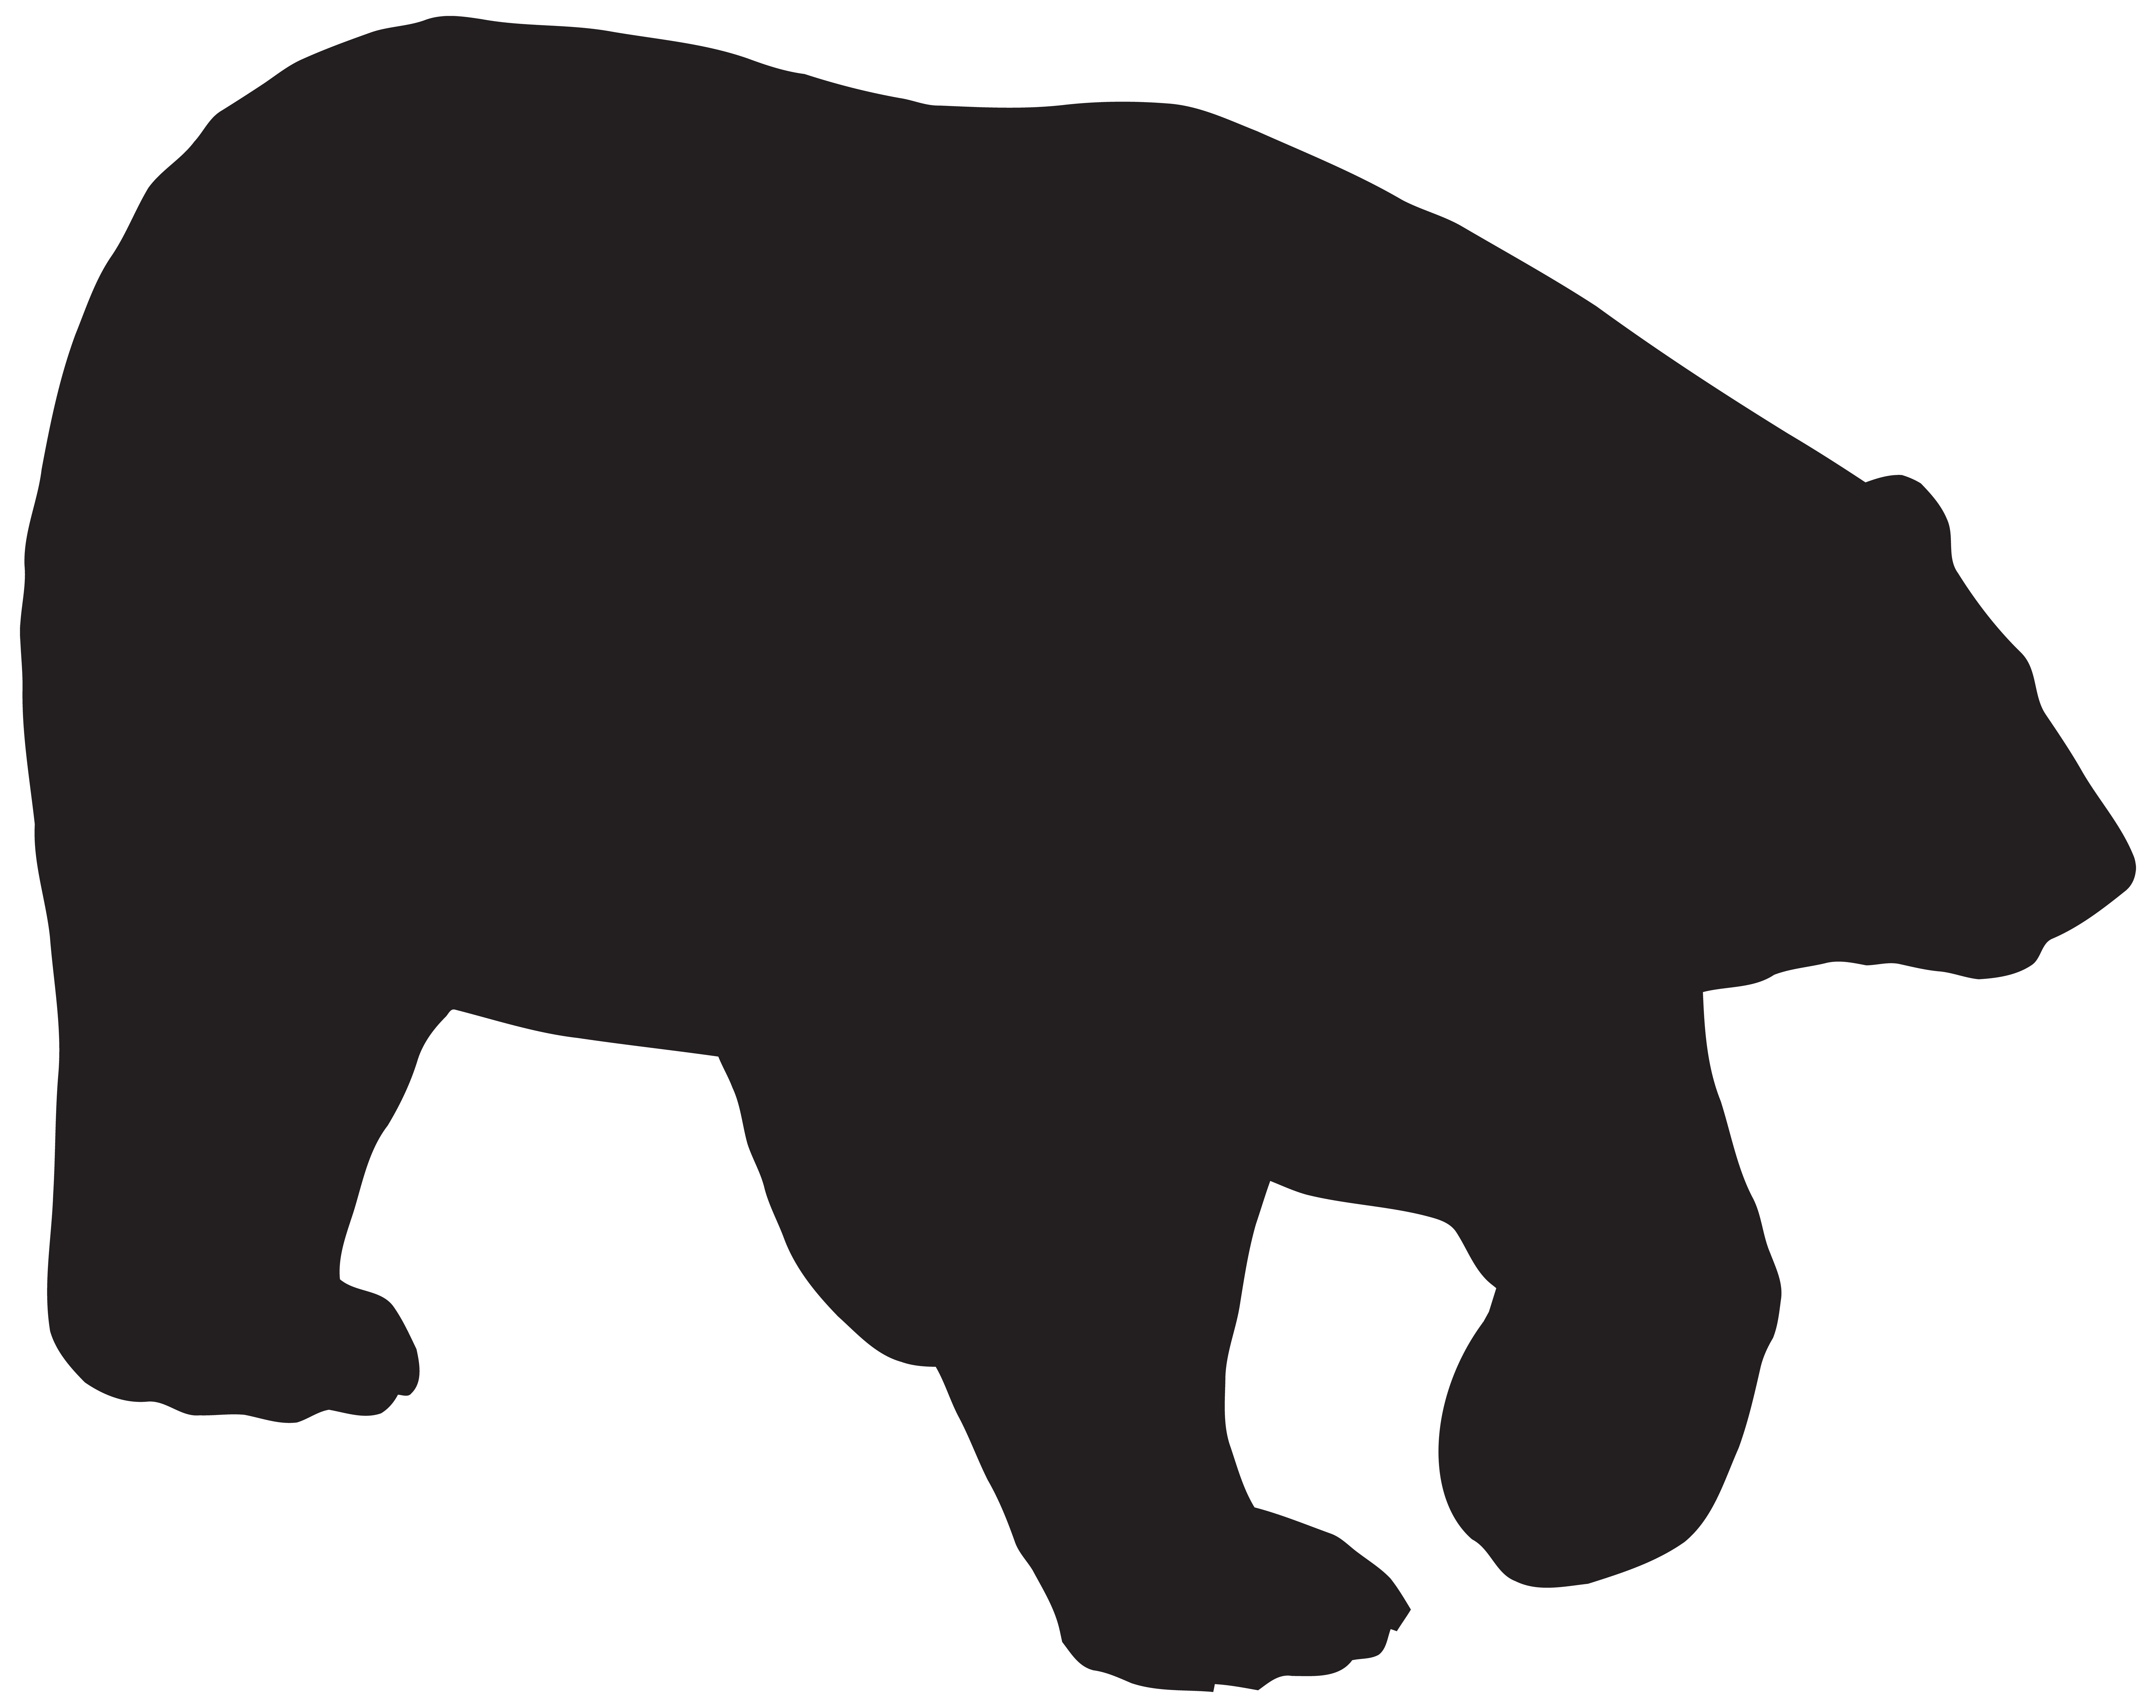 Polar Bear Silhouette PNG Clip Art Image.